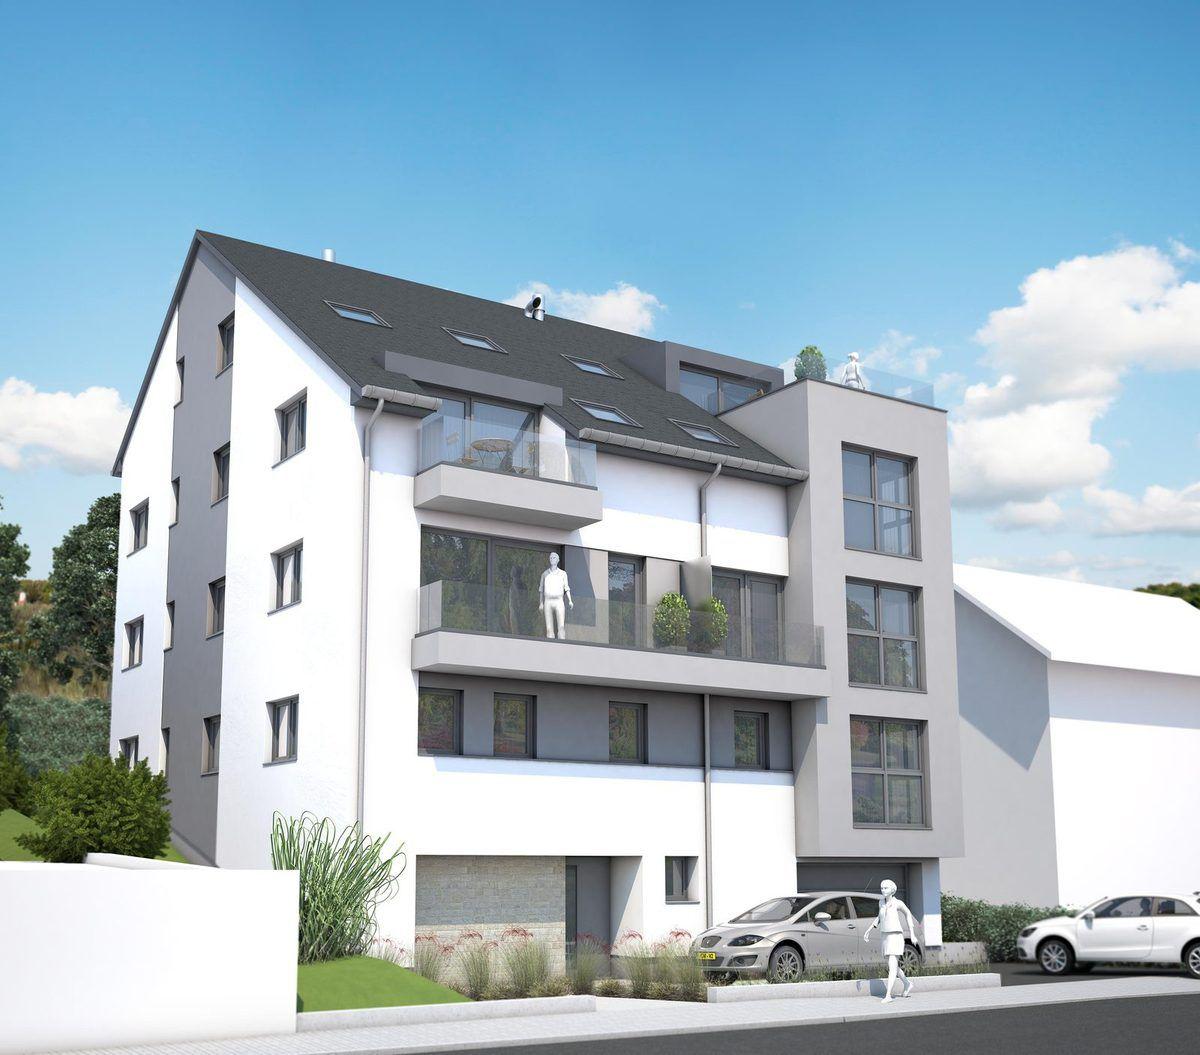 Lintgen - Appartements - 2014